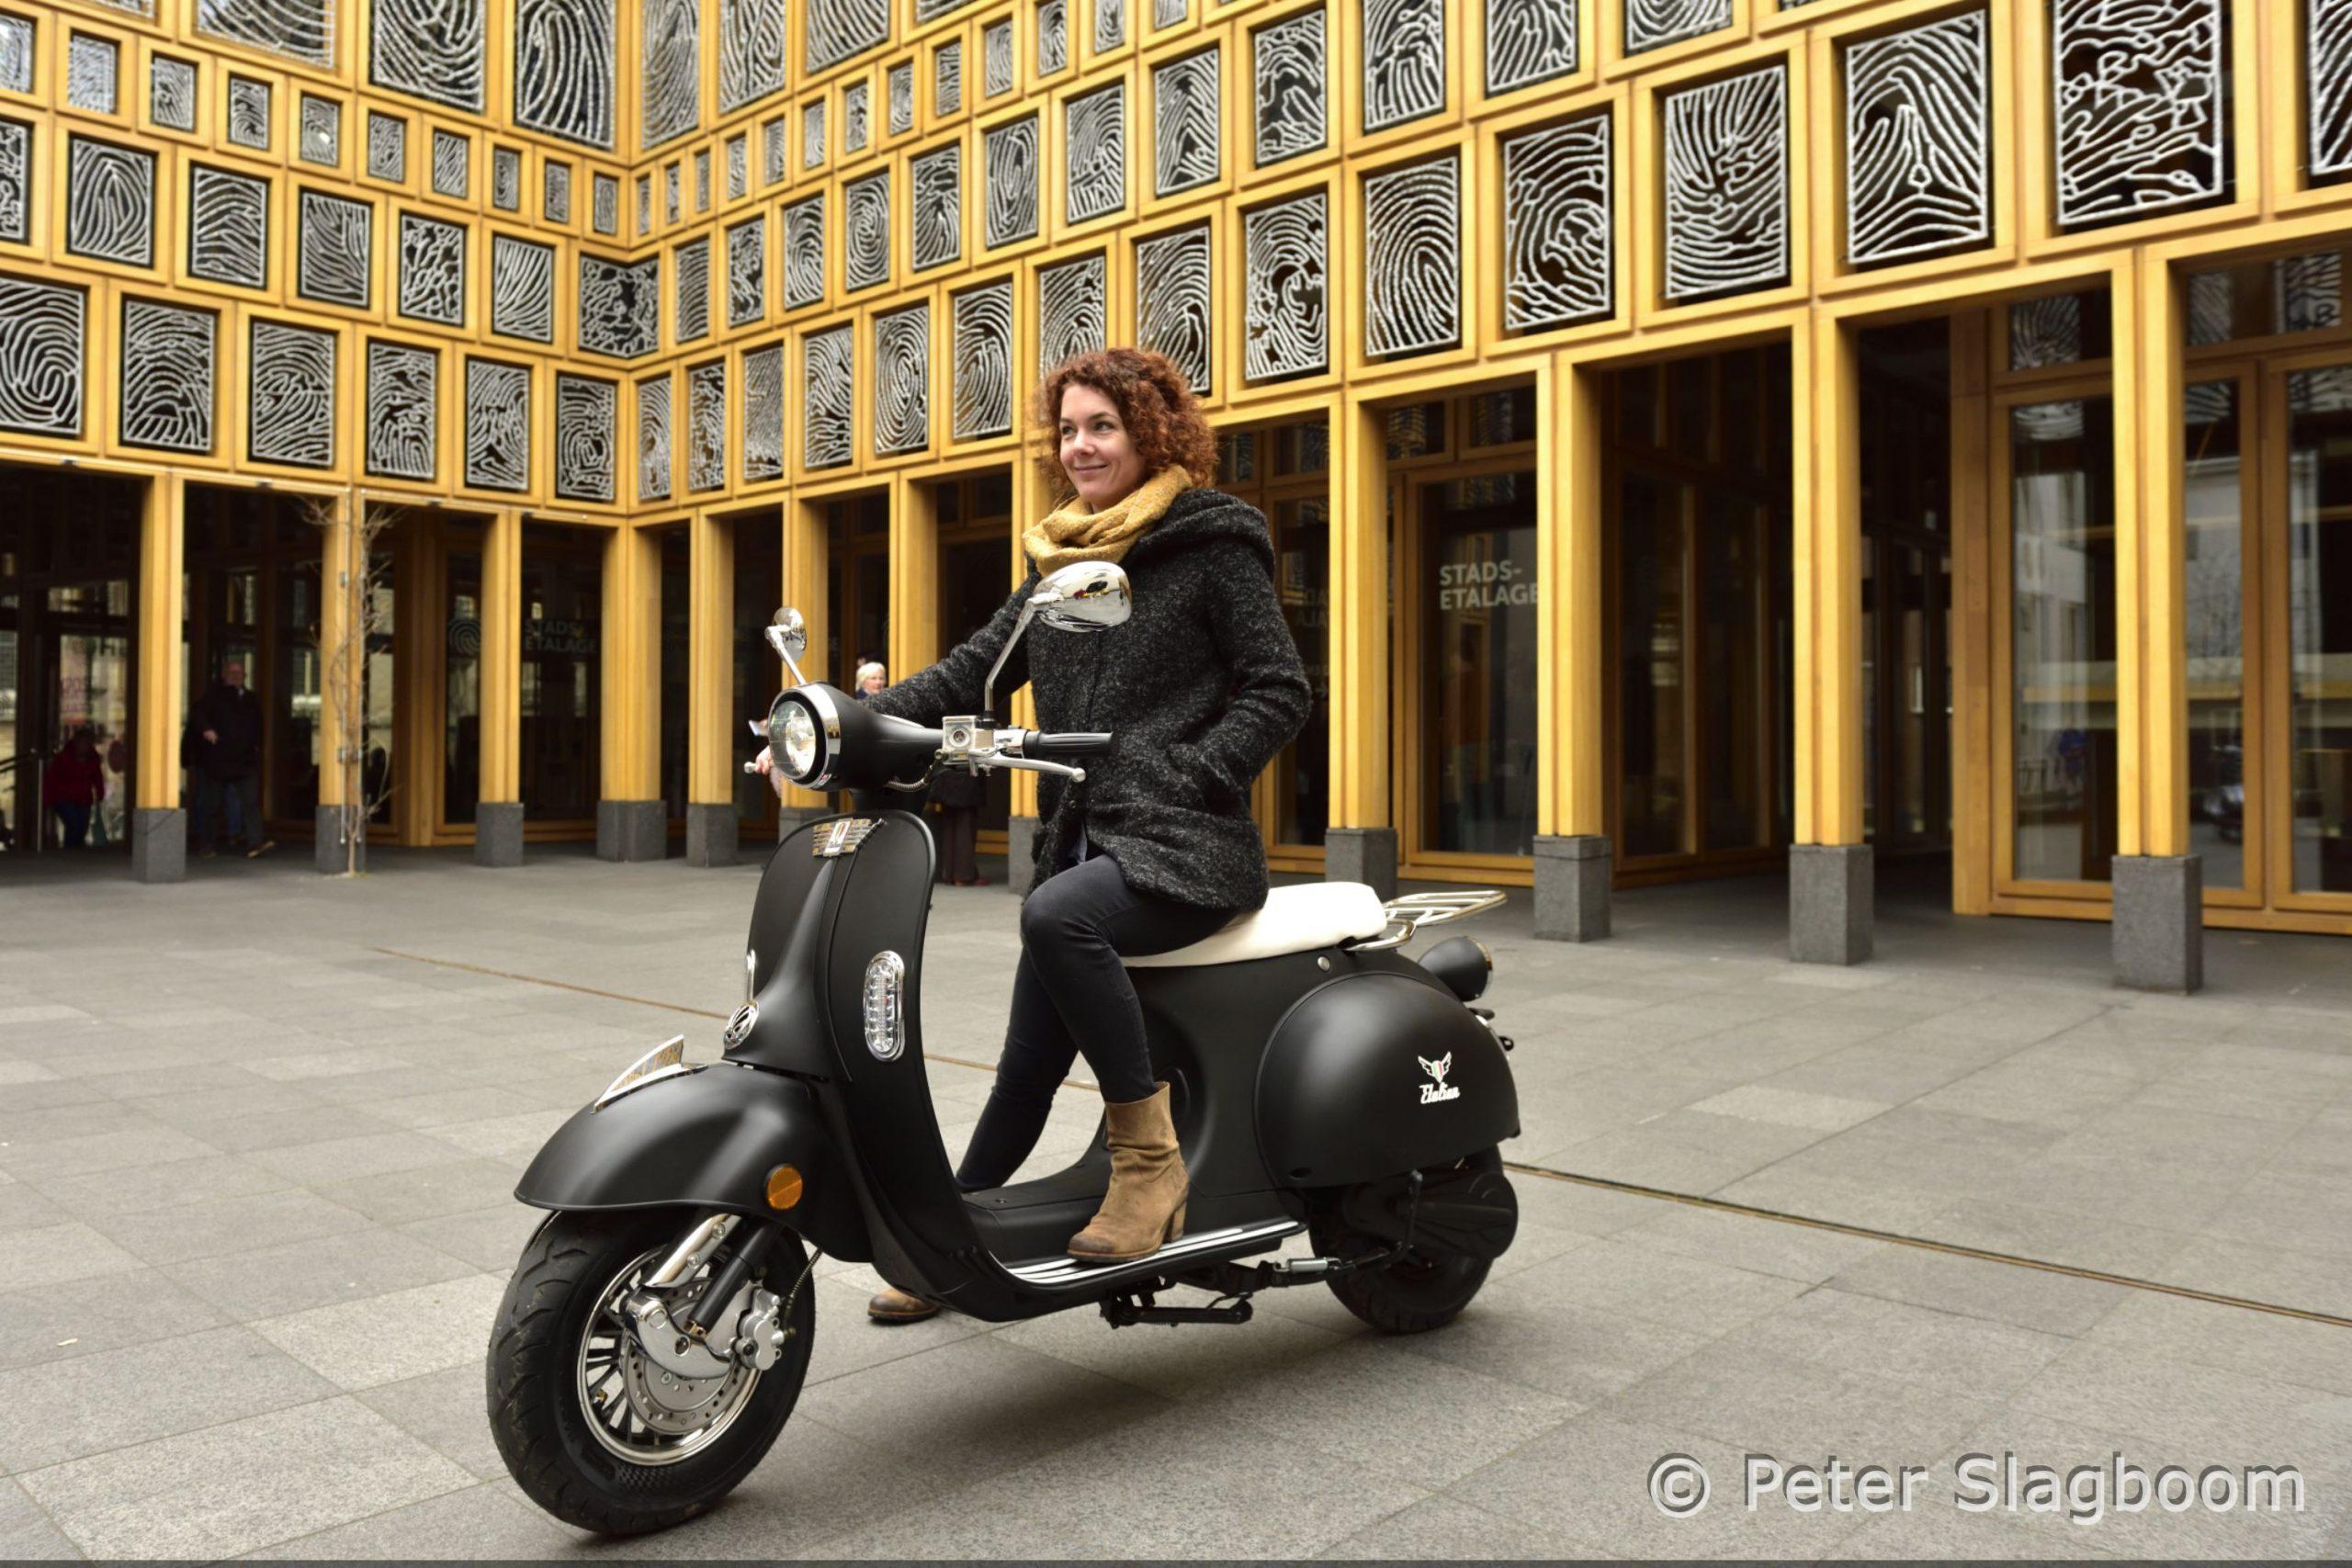 Etalian e-scooters